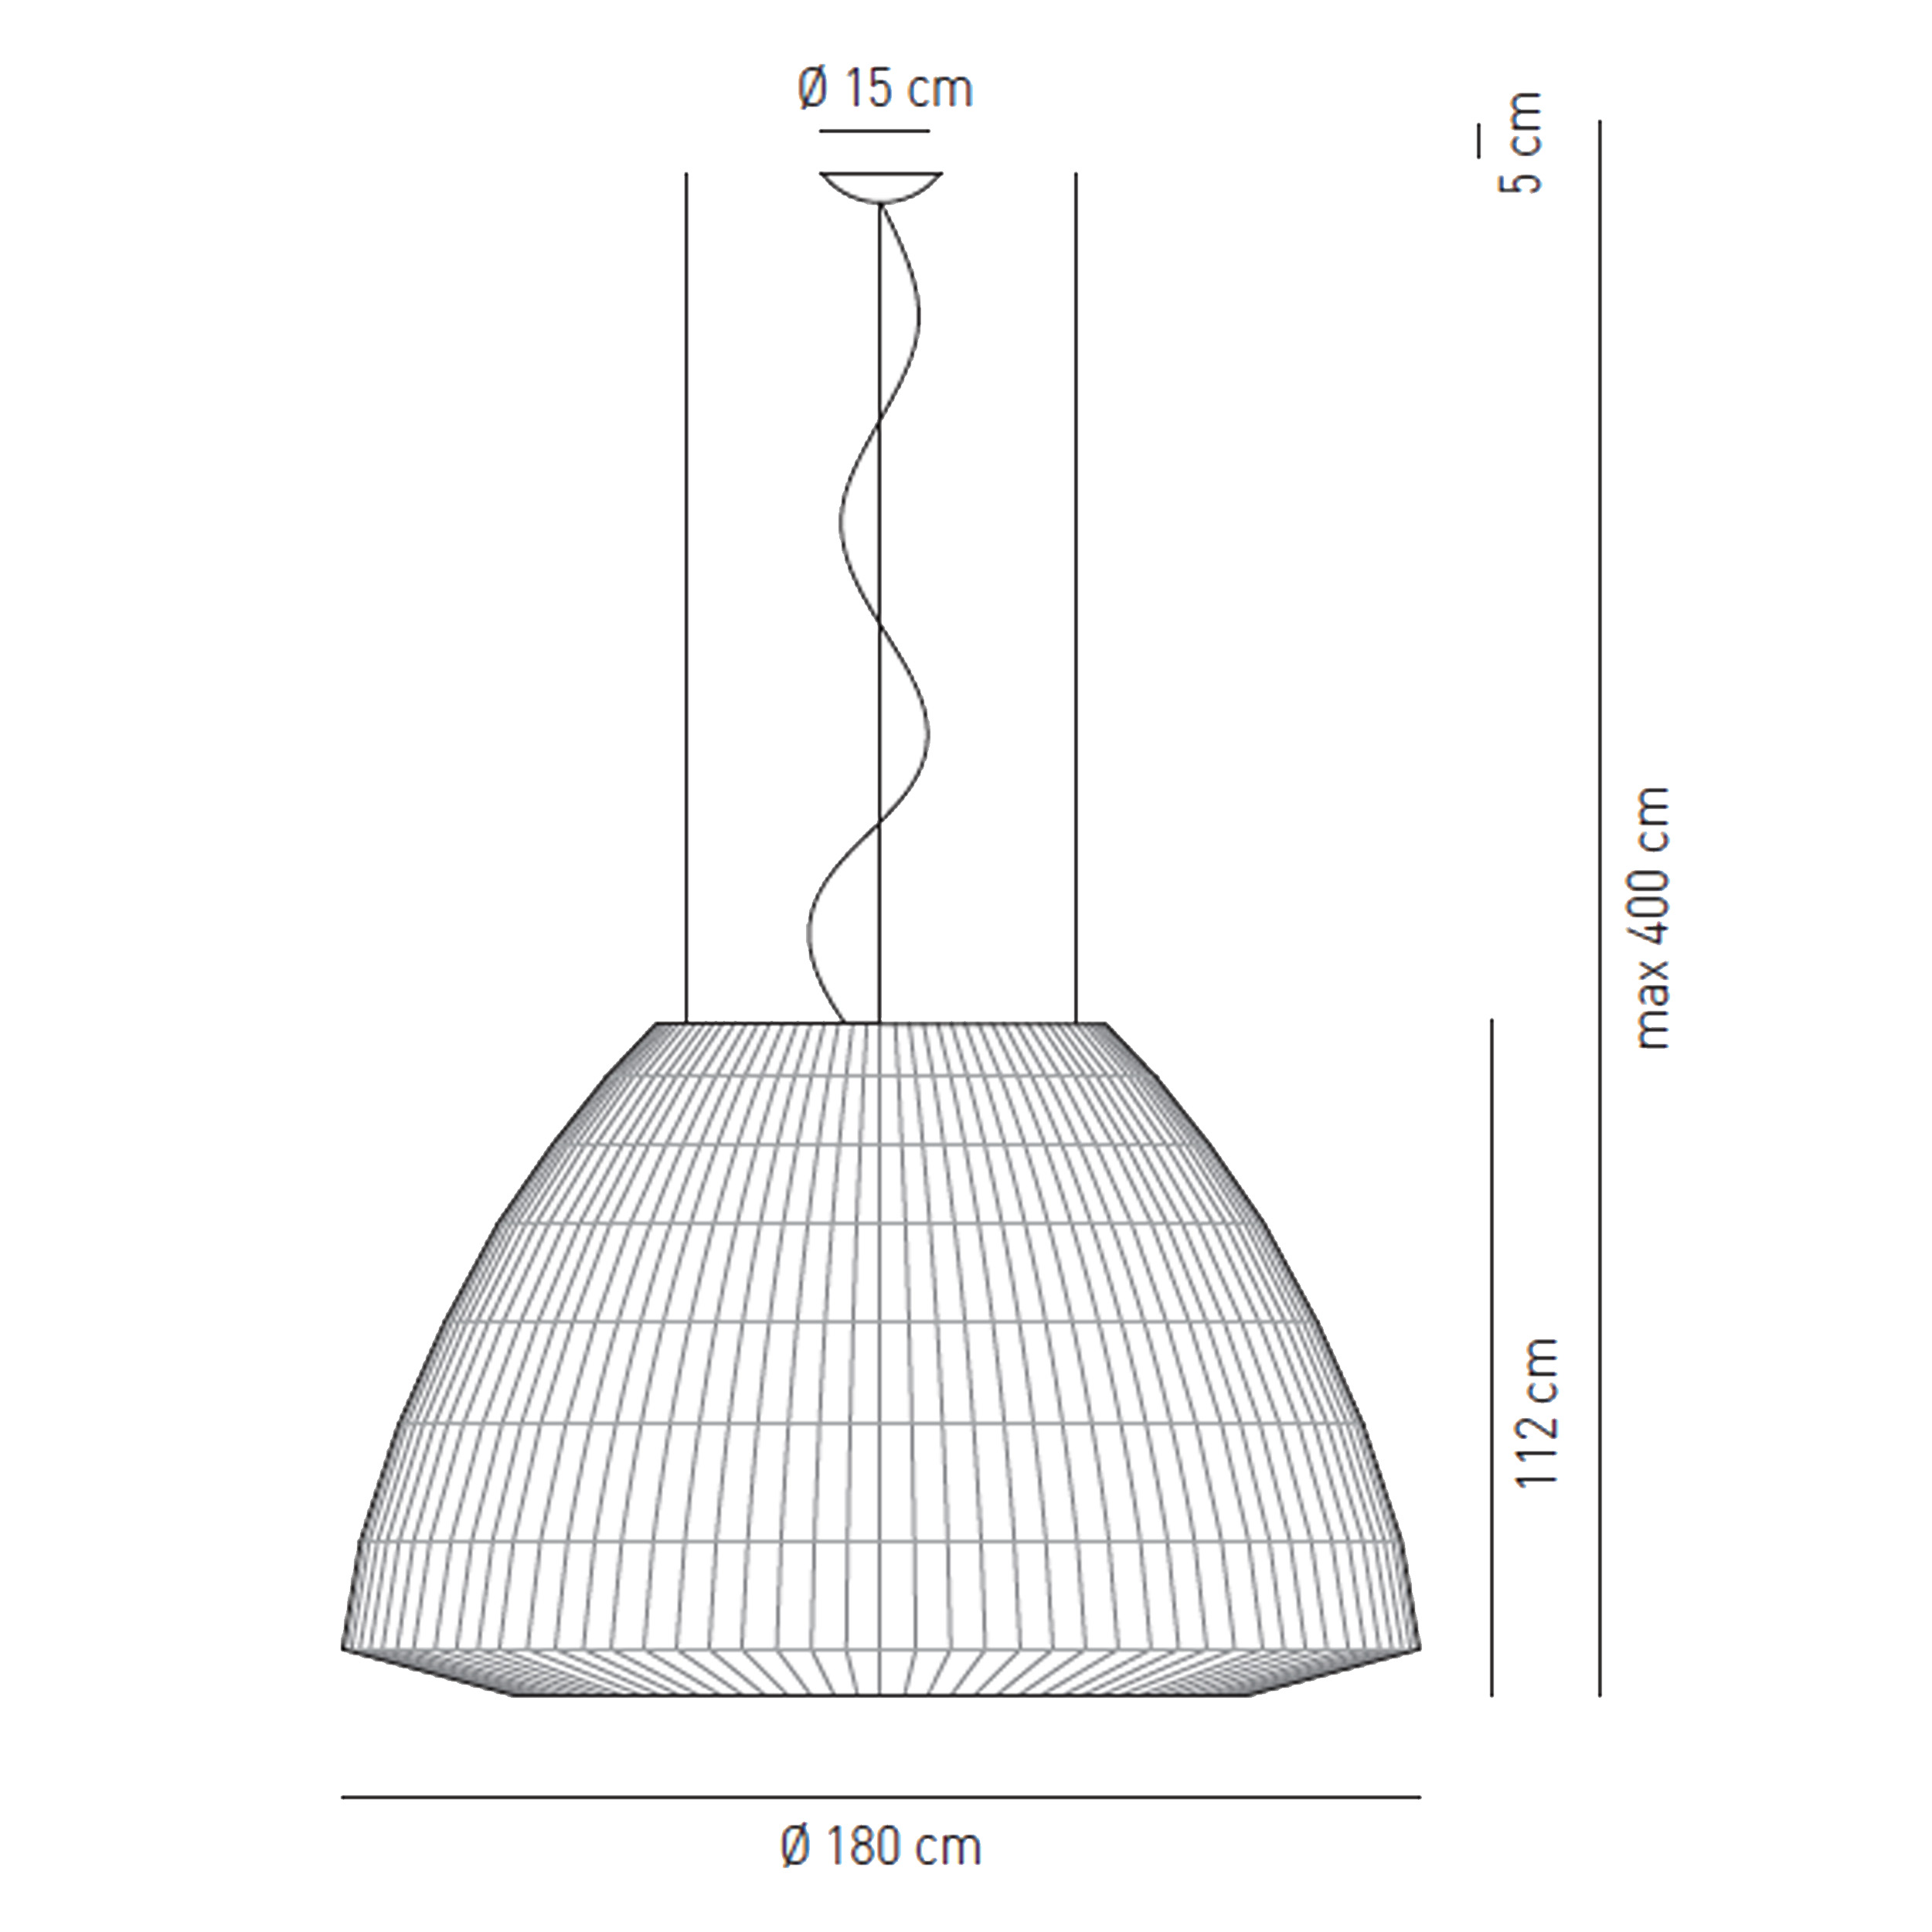 Axolight Bell 180 Pendant Light Line Drawing